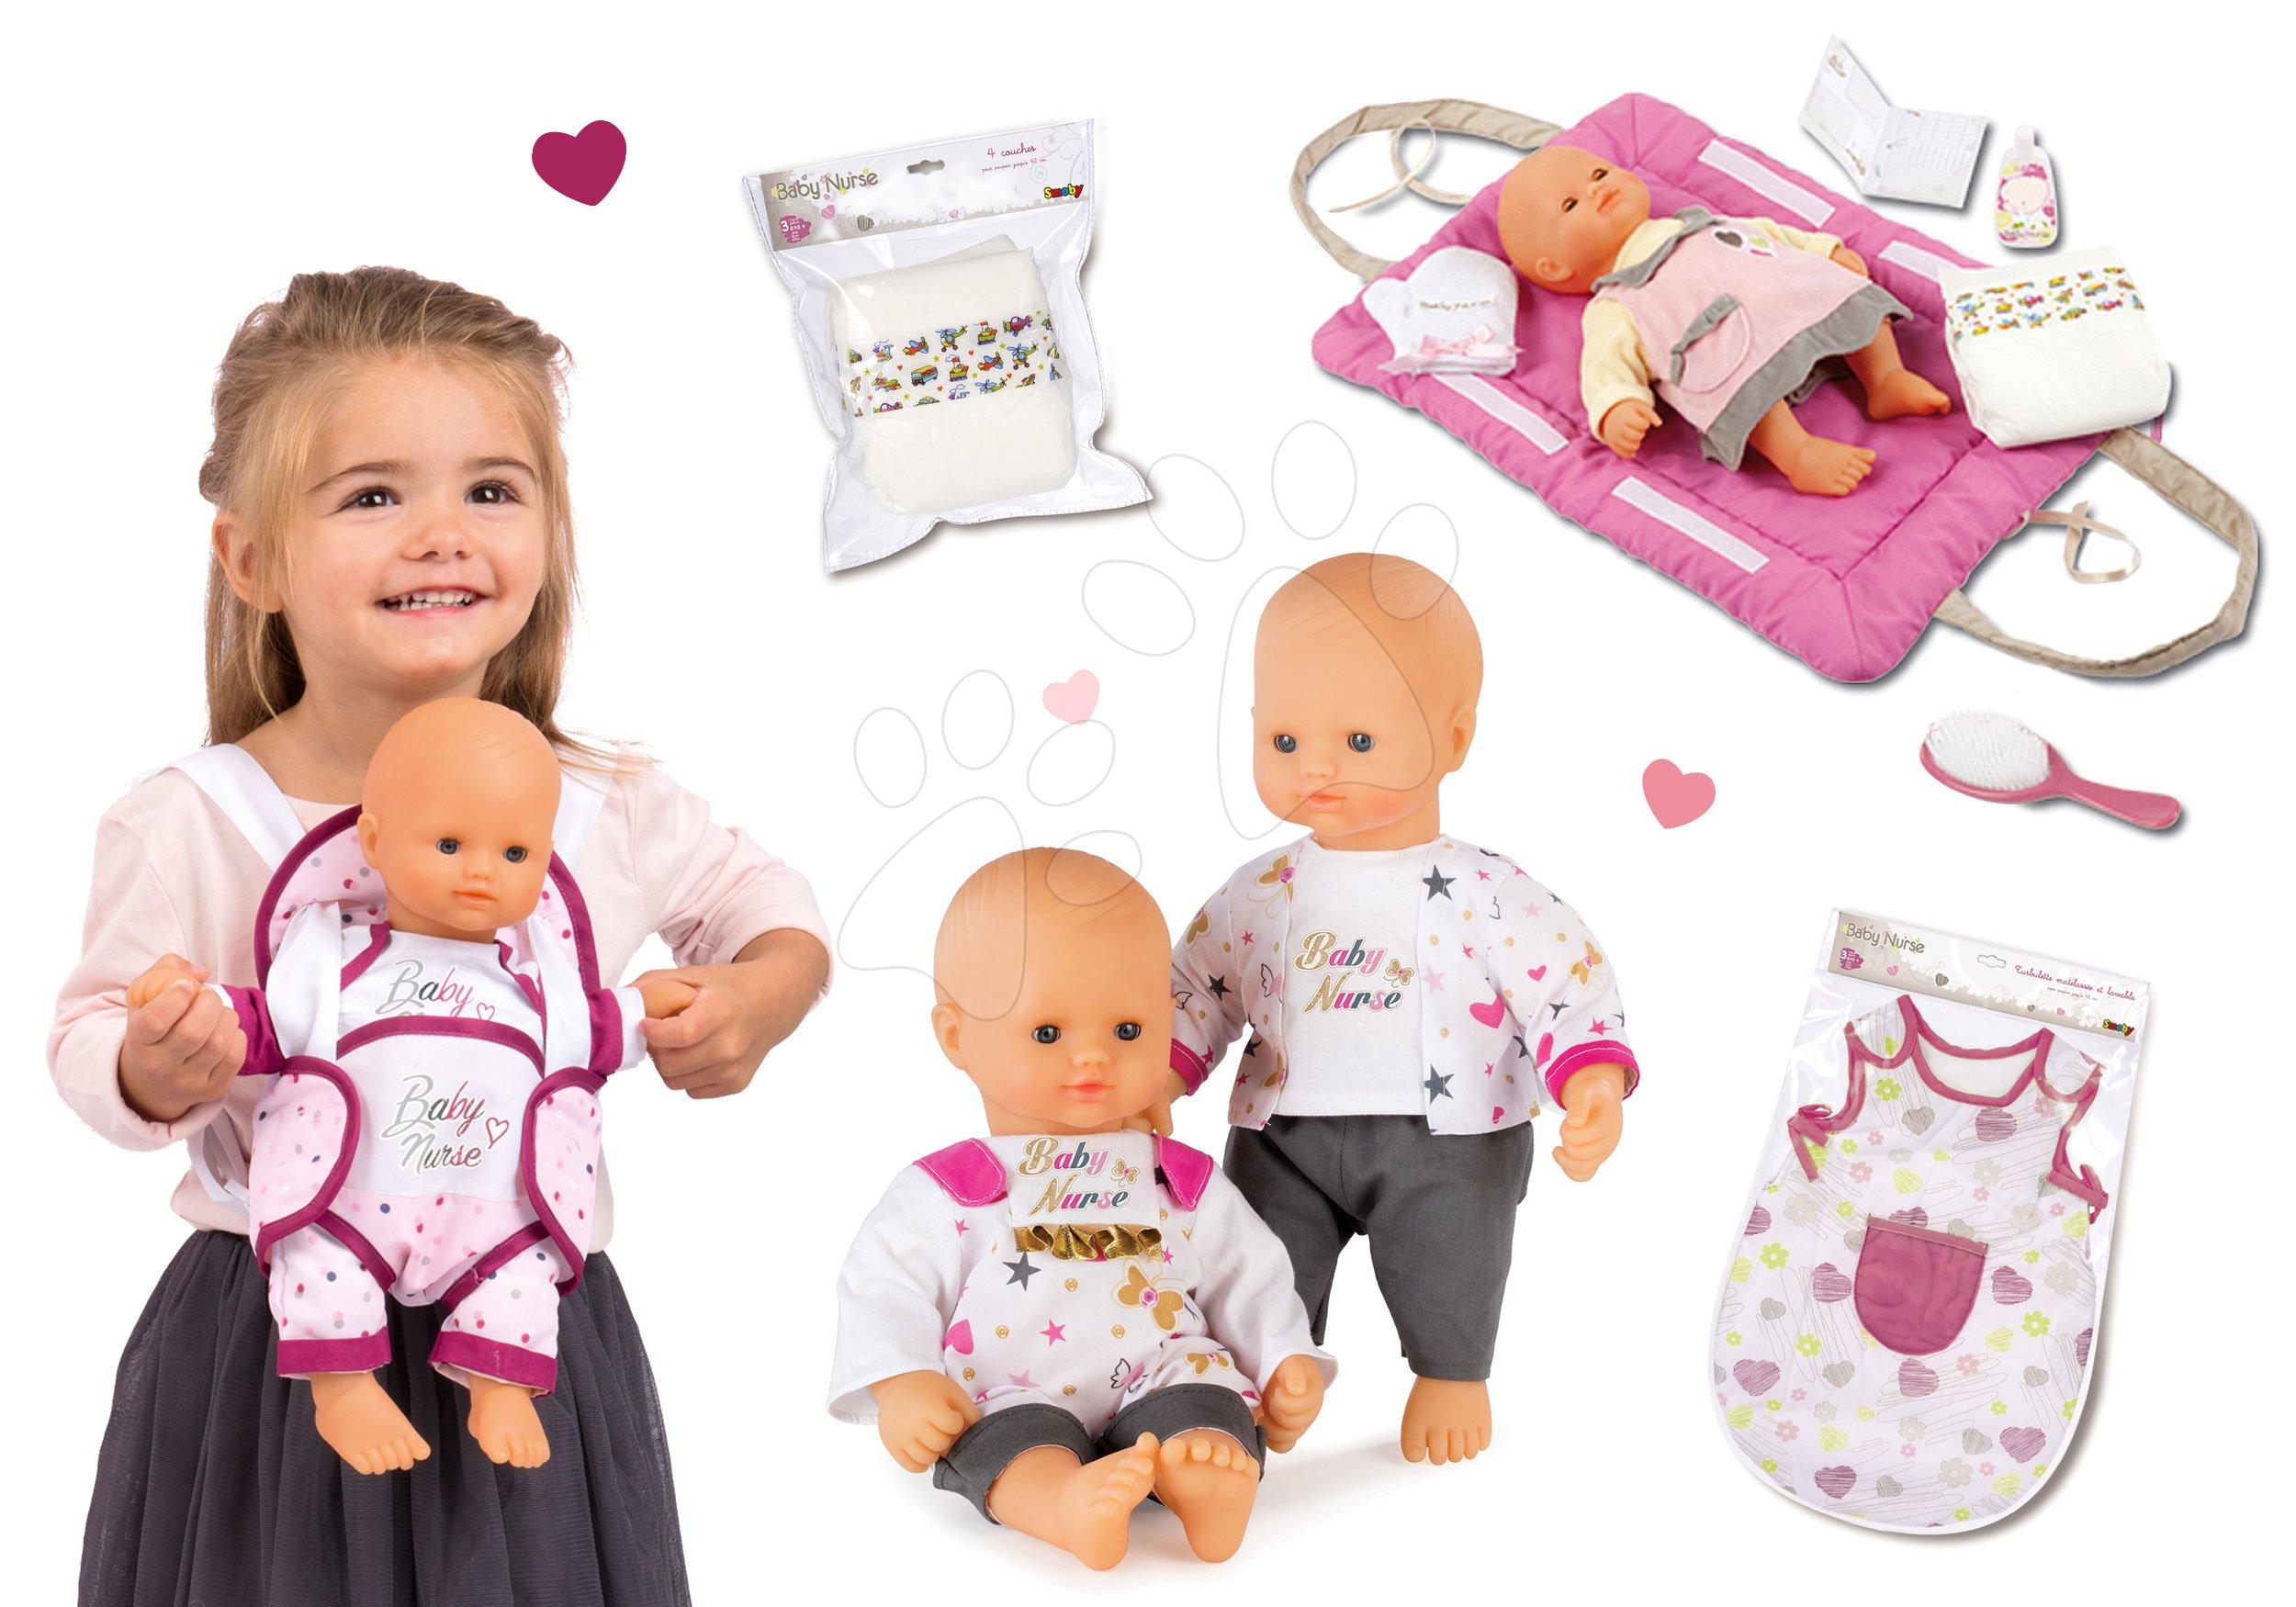 Set panenka Baby Nurse Zlatá edice Smoby 32 cm, noční úbor, přebalovací podložka, klokanka a sada plenek